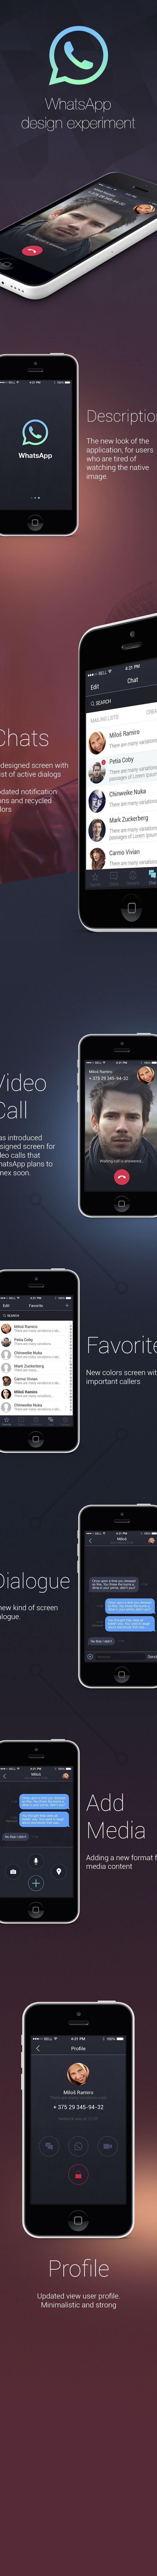 Whats App. Design Experiment